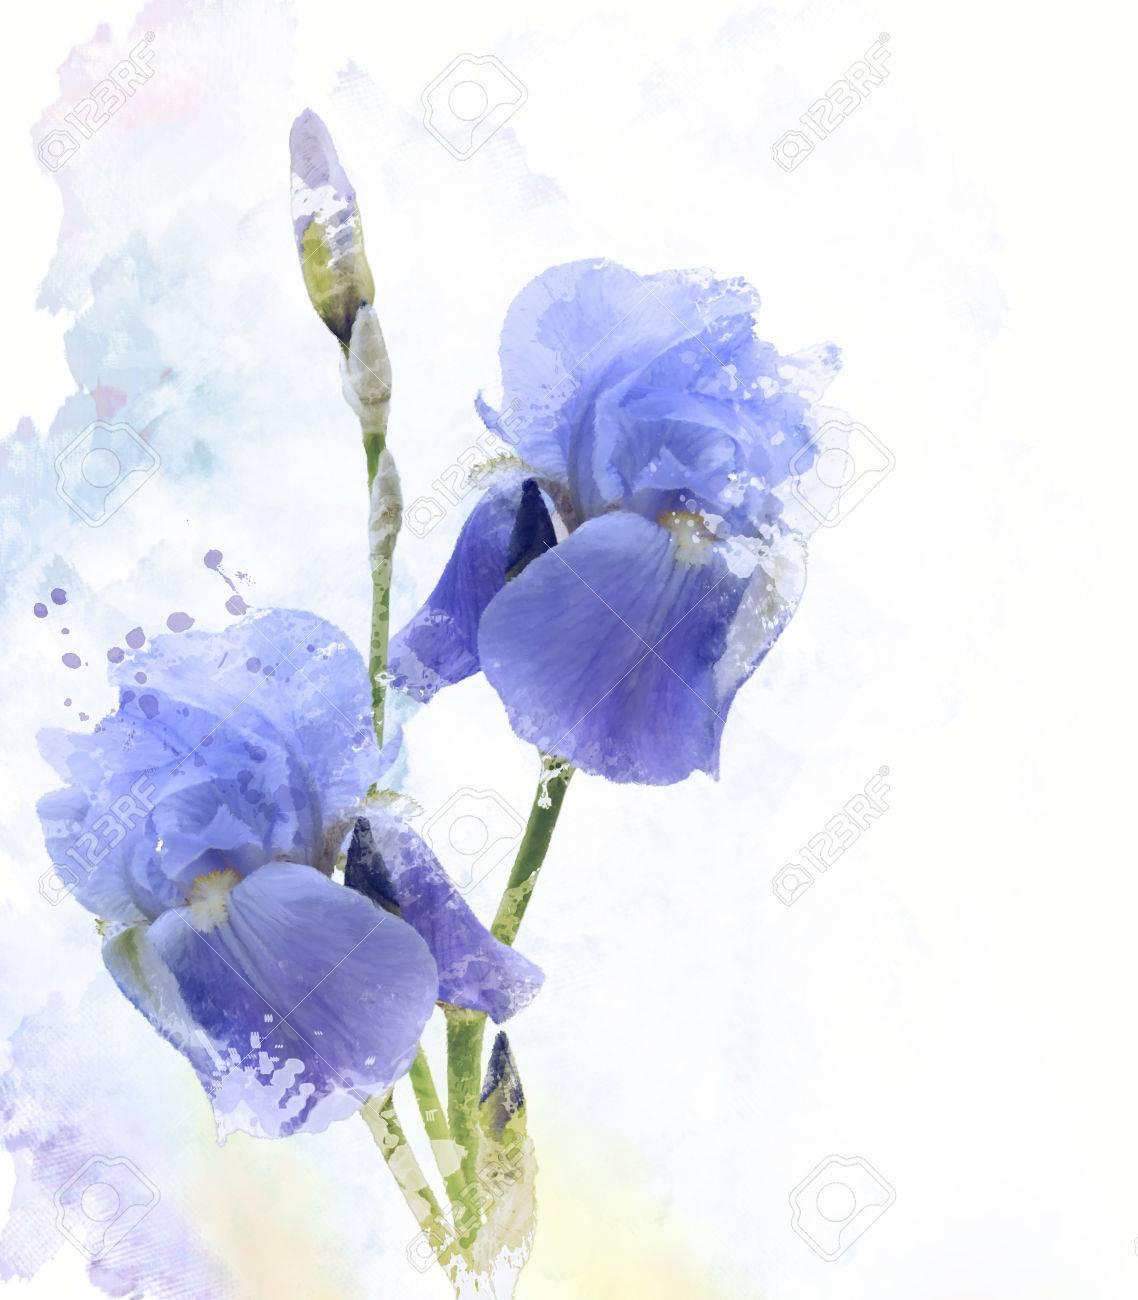 Digital painting of iris flowers stock photo picture and royalty digital painting of iris flowers stock photo 40984719 izmirmasajfo